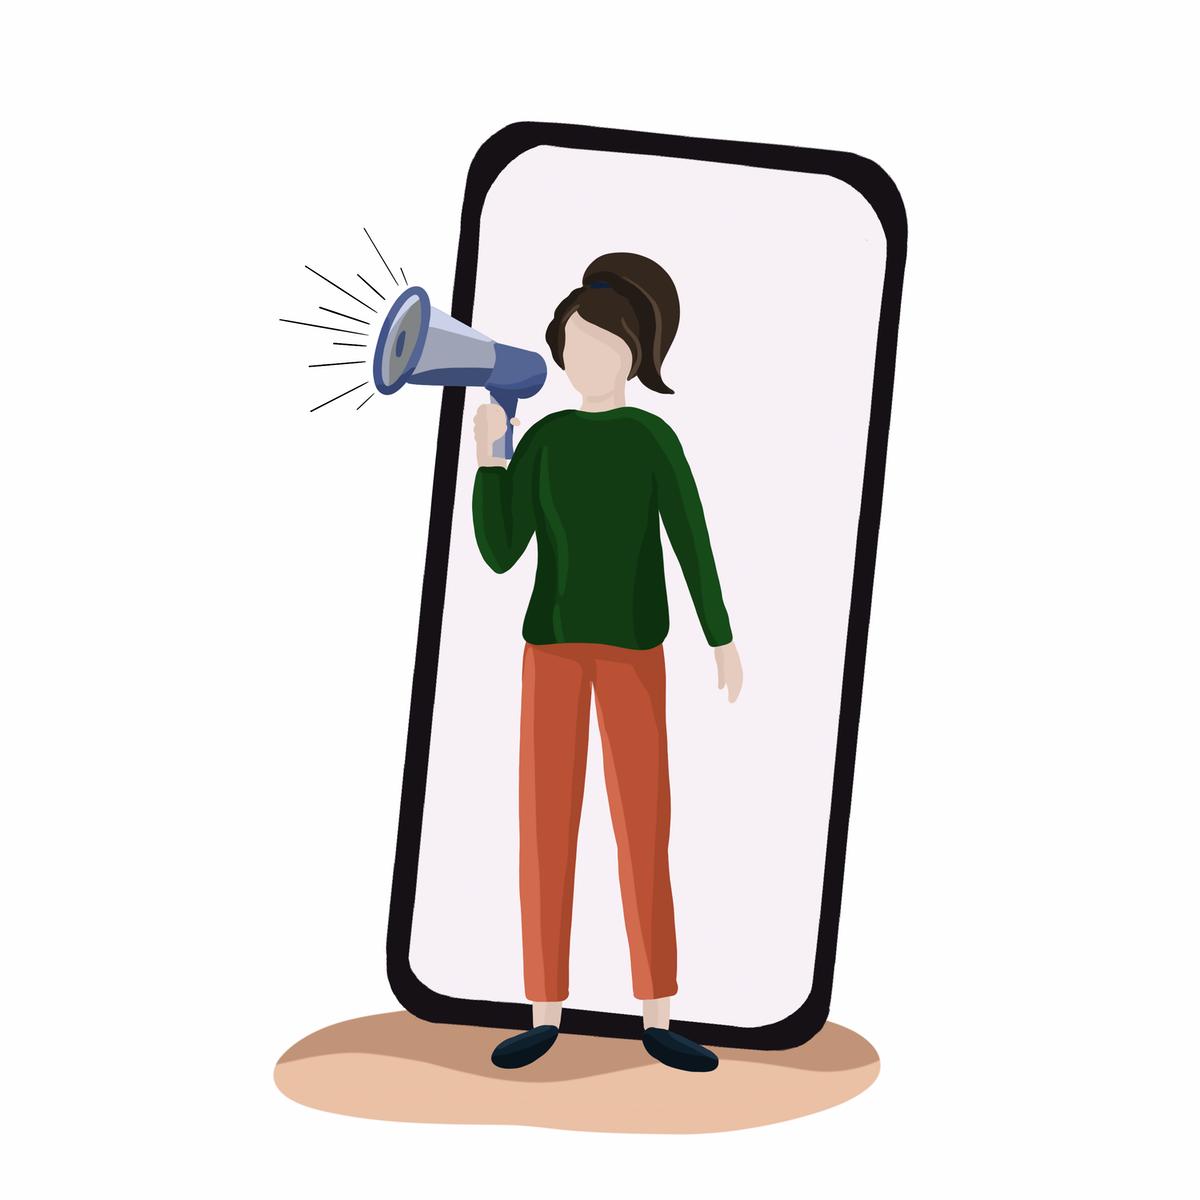 Illustrations for Motivation App